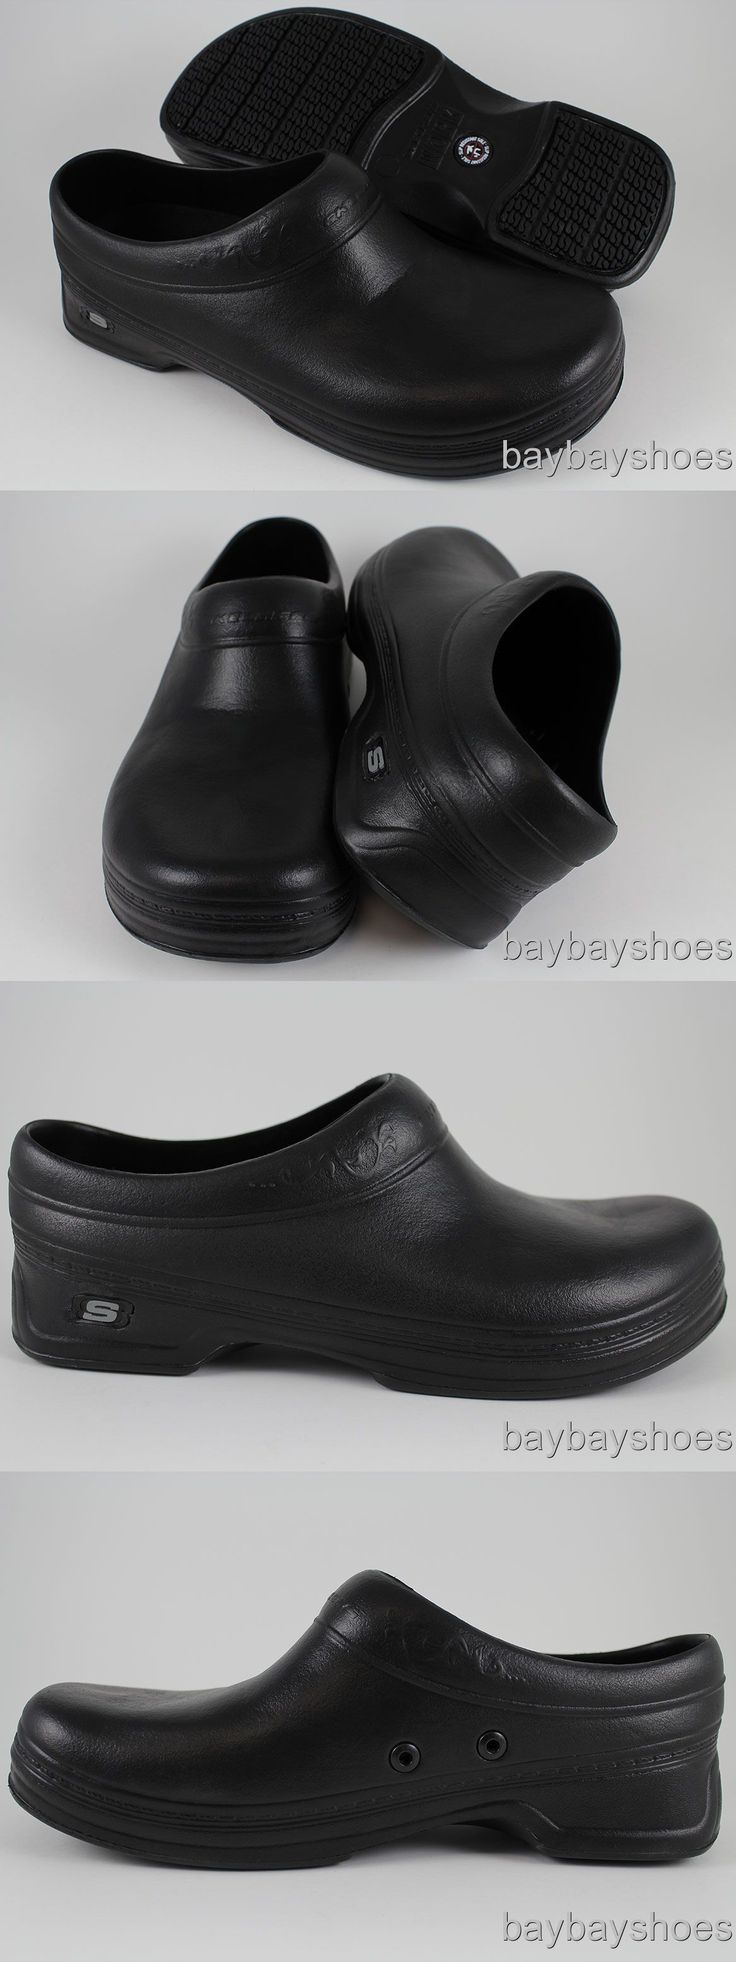 Occupational 53548: Skechers Oswald Clara Black Slip Resistant Work Crocs Slippers Slip-On Womens -> BUY IT NOW ONLY: $44.99 on eBay!